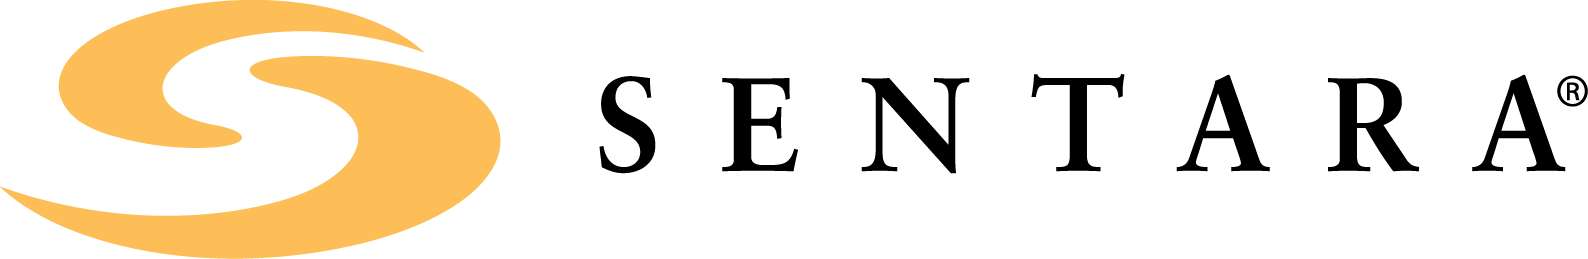 https://oceanconstructionservices.com/wp-content/uploads/2018/02/Logo_Sentara.png